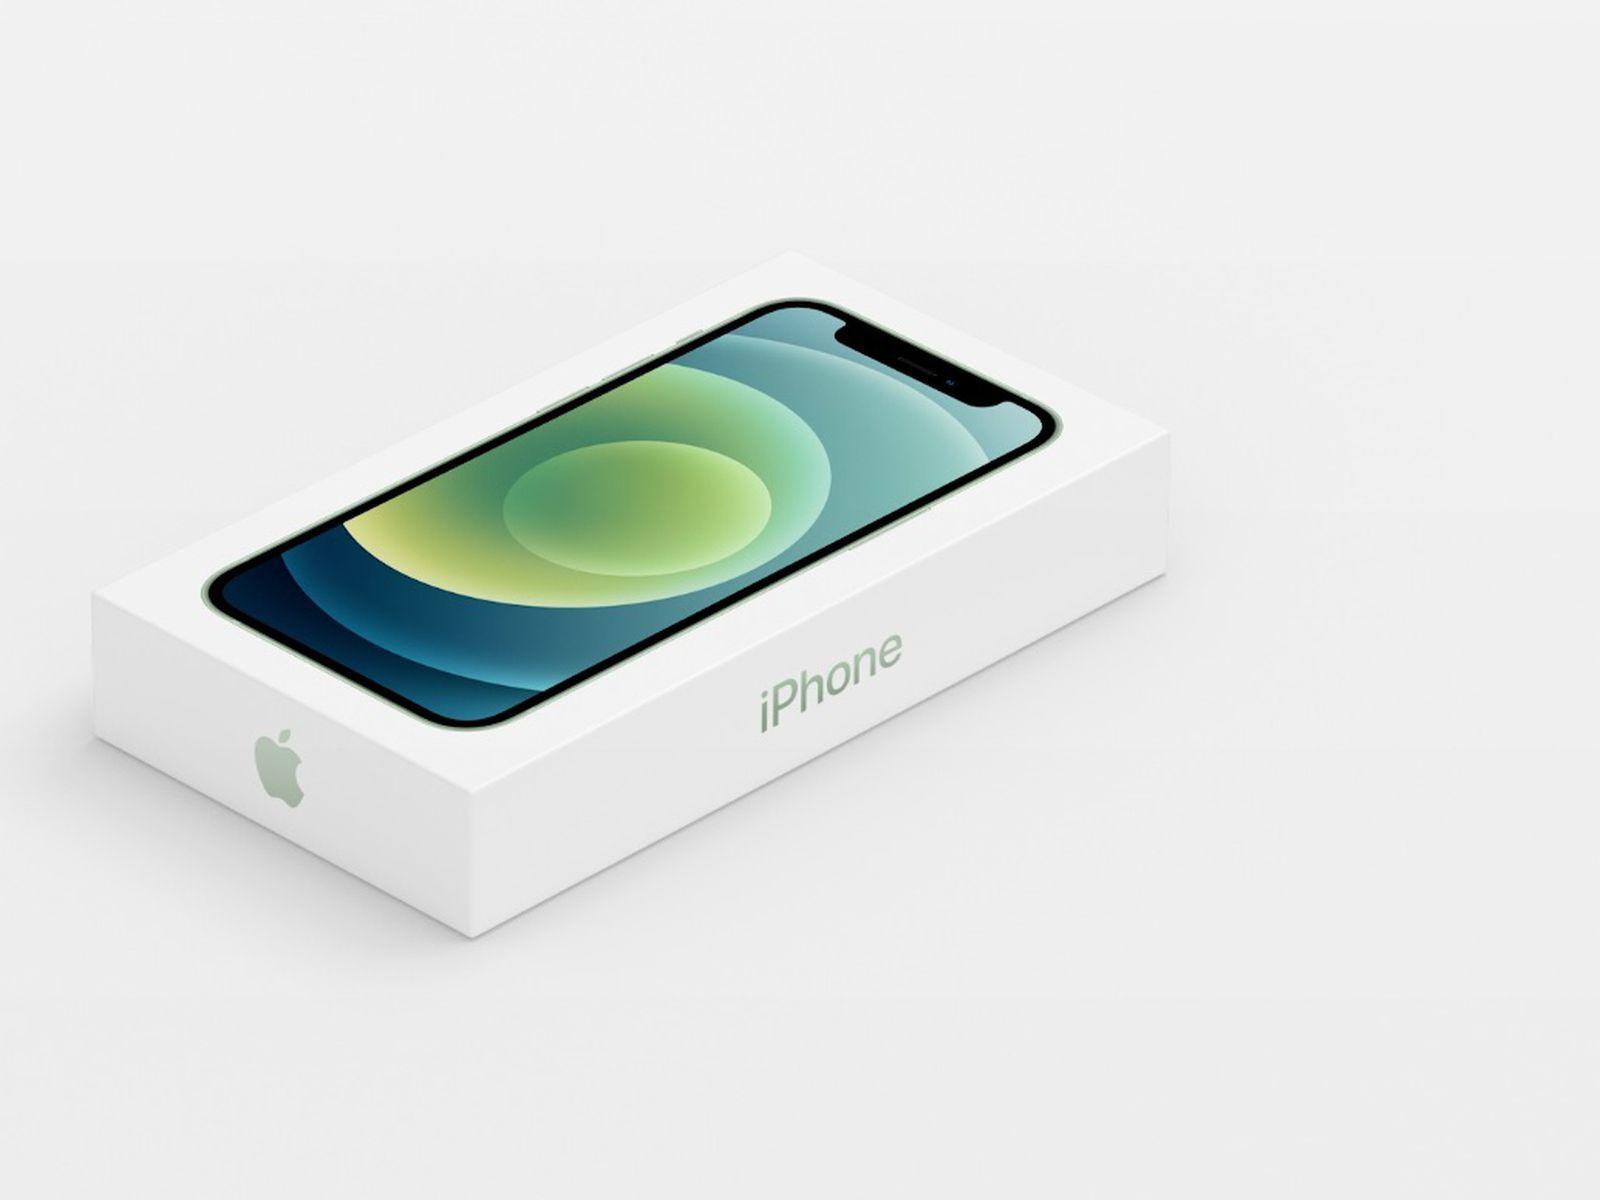 Бразилия обязала Apple вернуть зарядку в коробки с iPhone